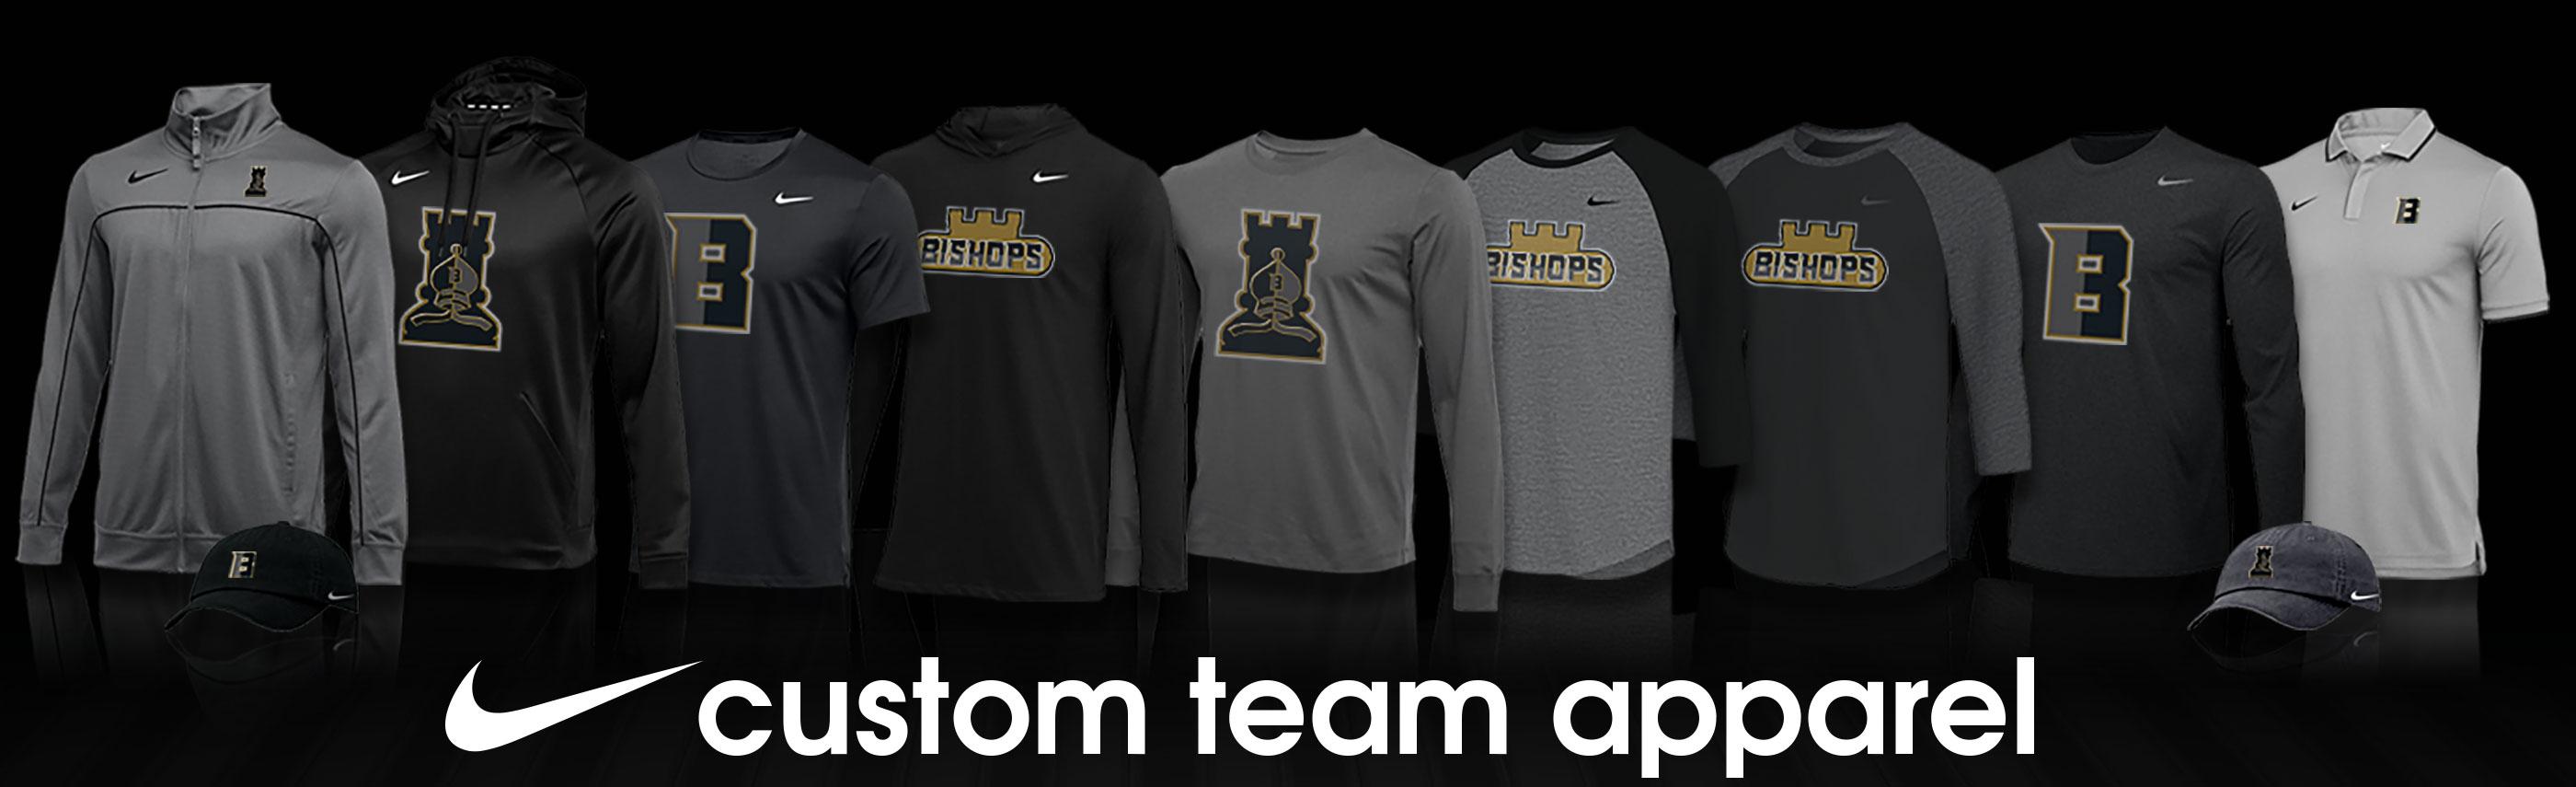 Nike Custom Team Apparel